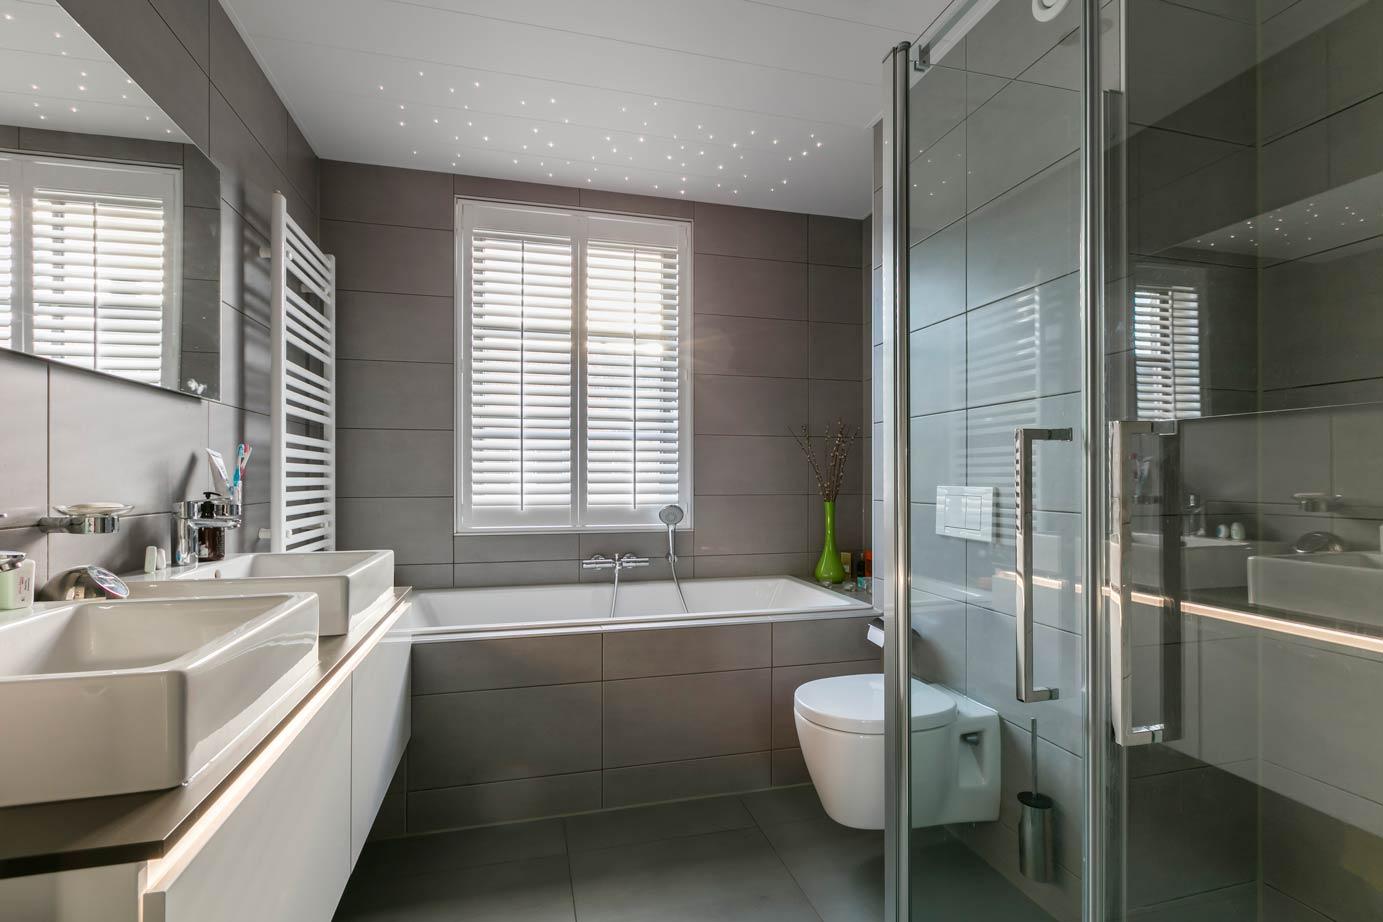 Natuurlijk Afgewerkte Badkamer : Moderne keuken en badkamer kopen in landsmeer db keukens